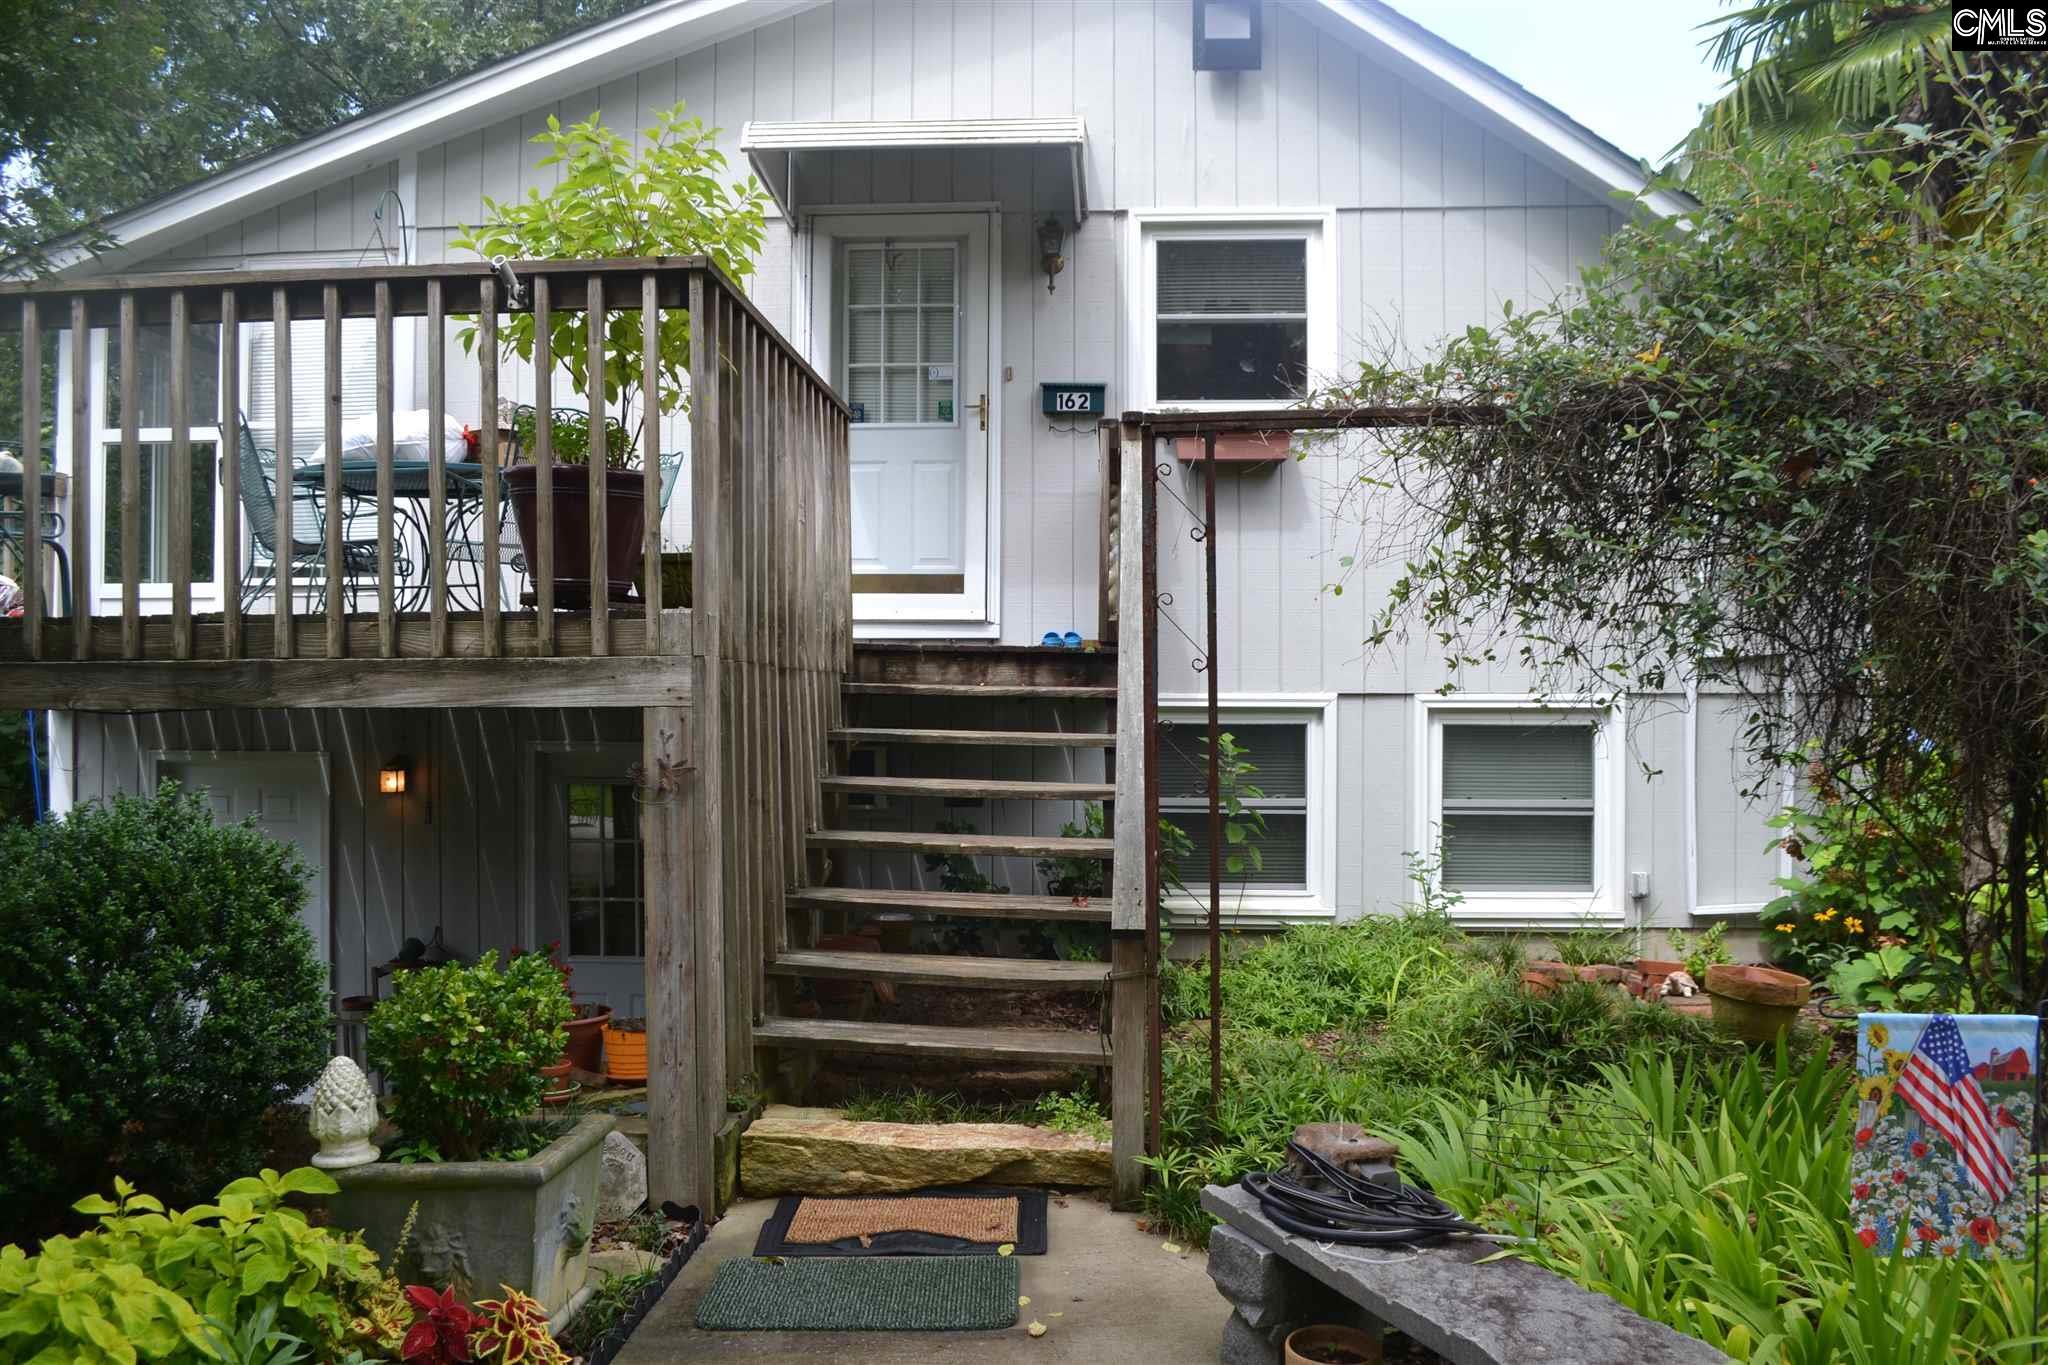 162 Hickory Ledge Winnsboro, SC 29180